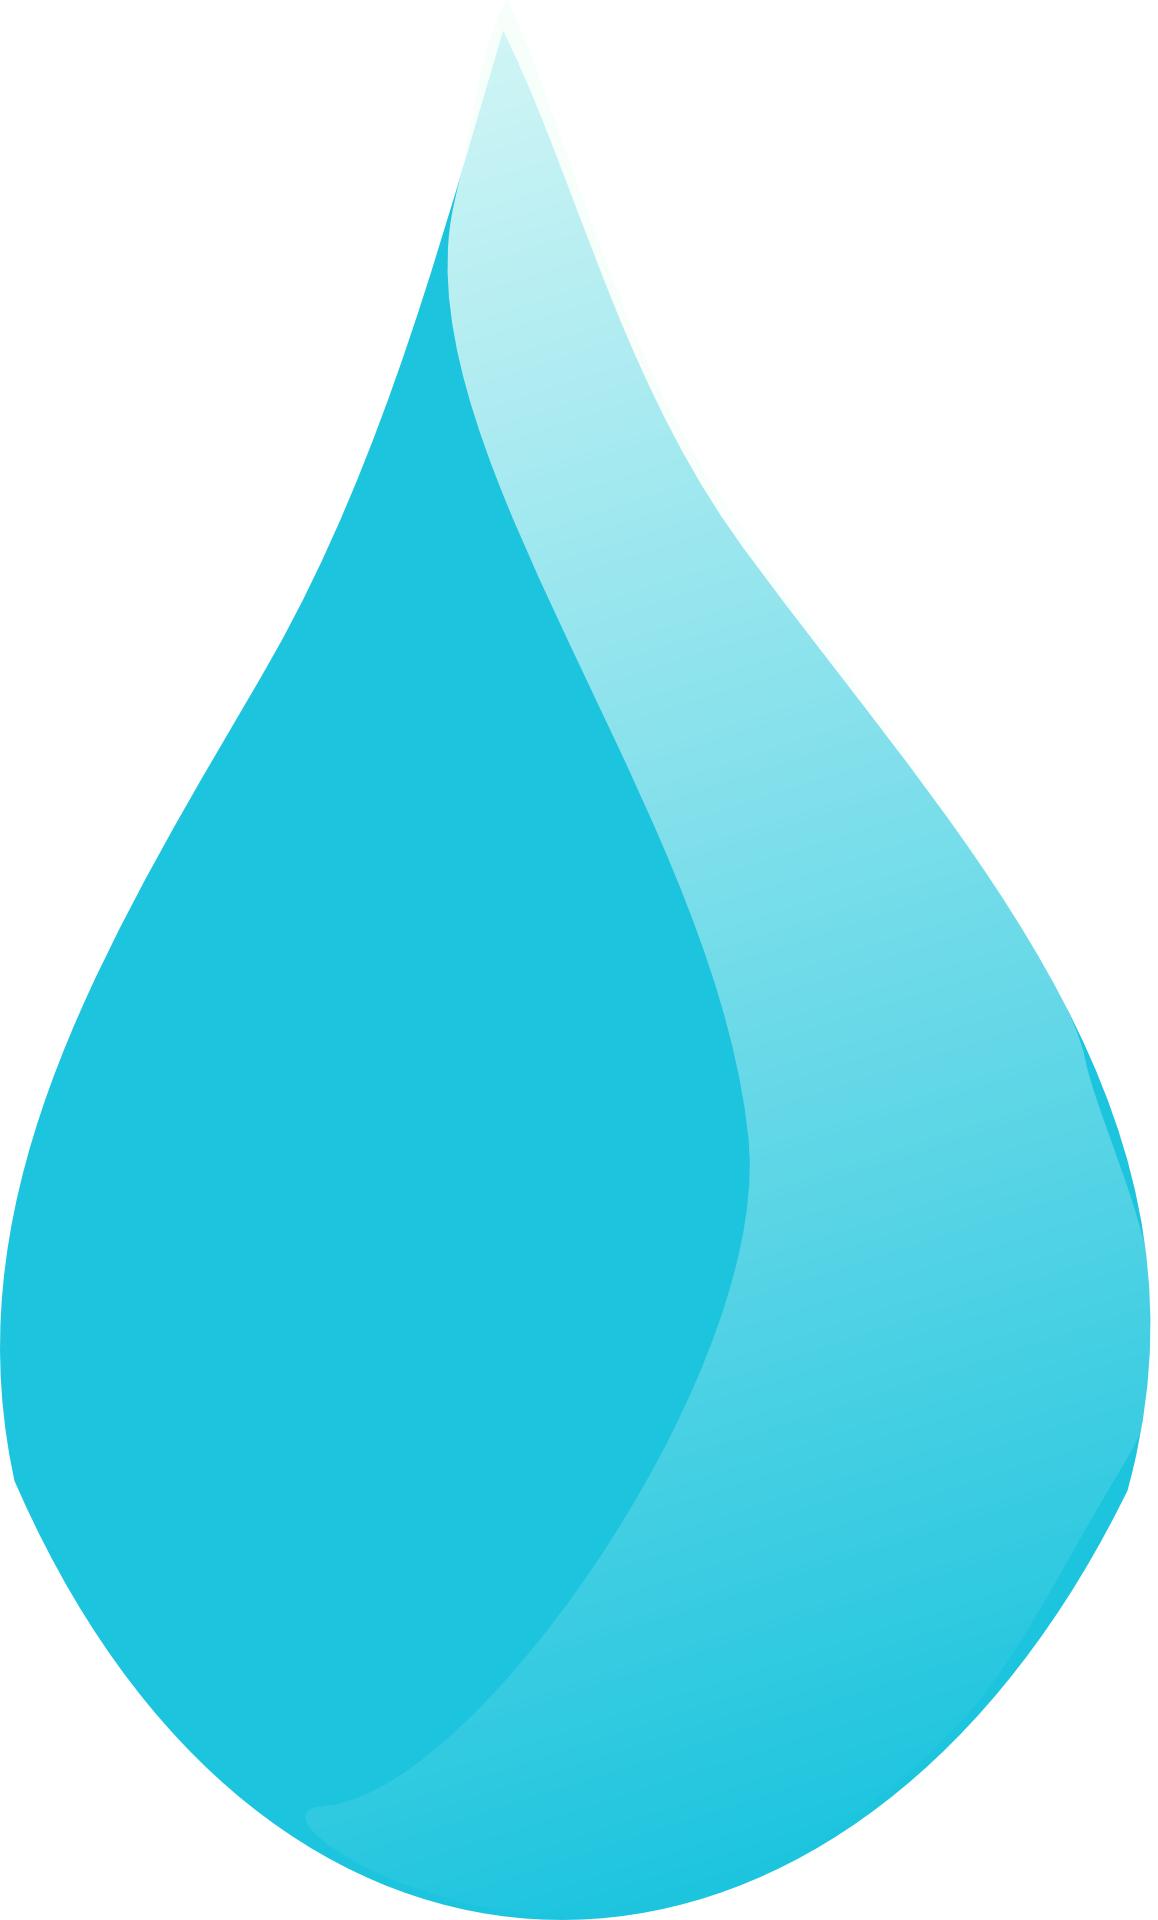 water drop, rain drop,blue, liquid, teardrop ,cartoon vector